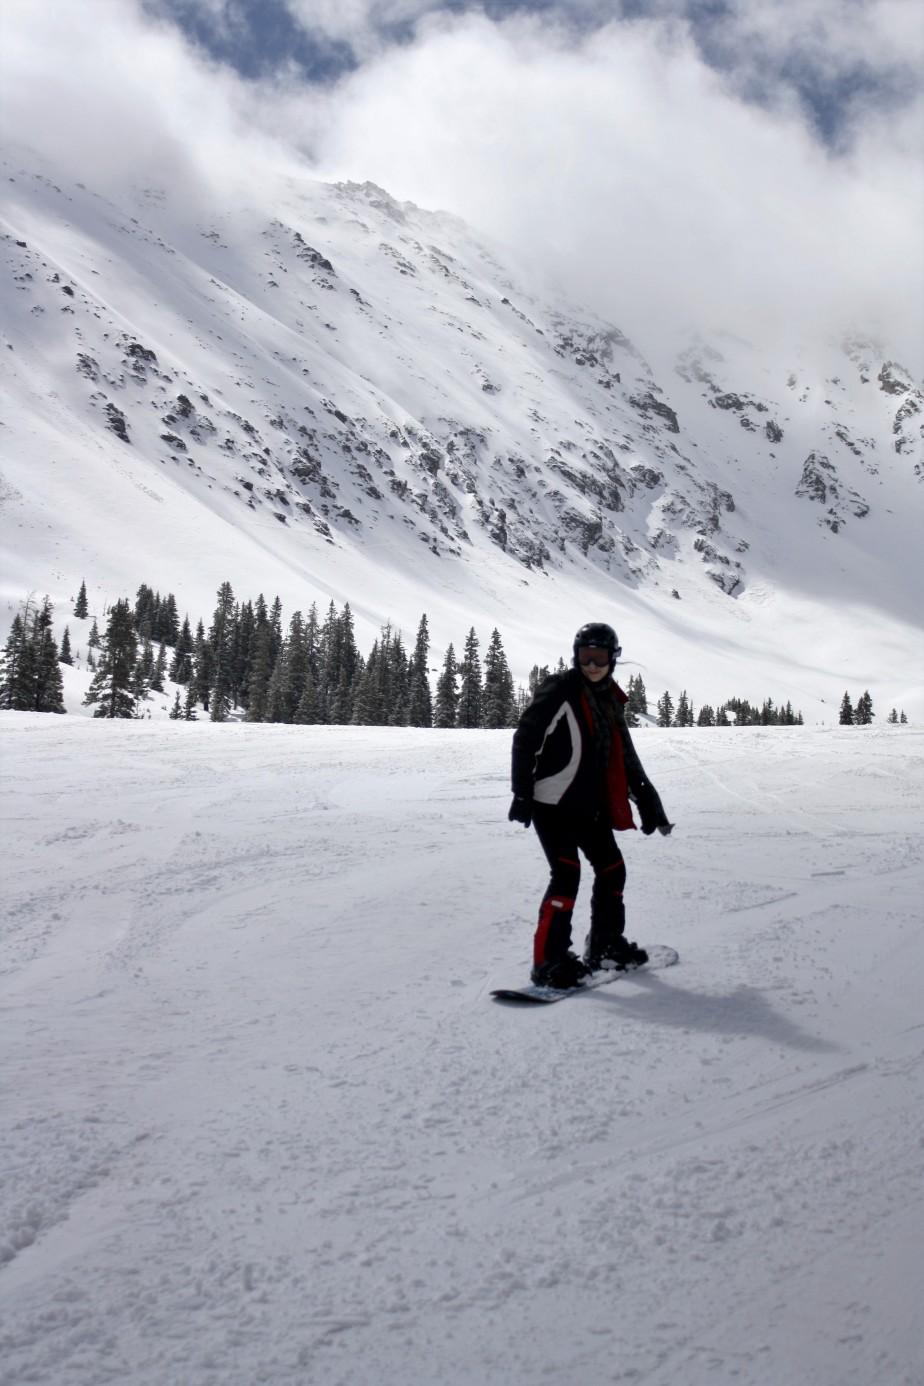 62 2010 05 20 Colorado 23 Arapahoe Basin Skiing.jpg